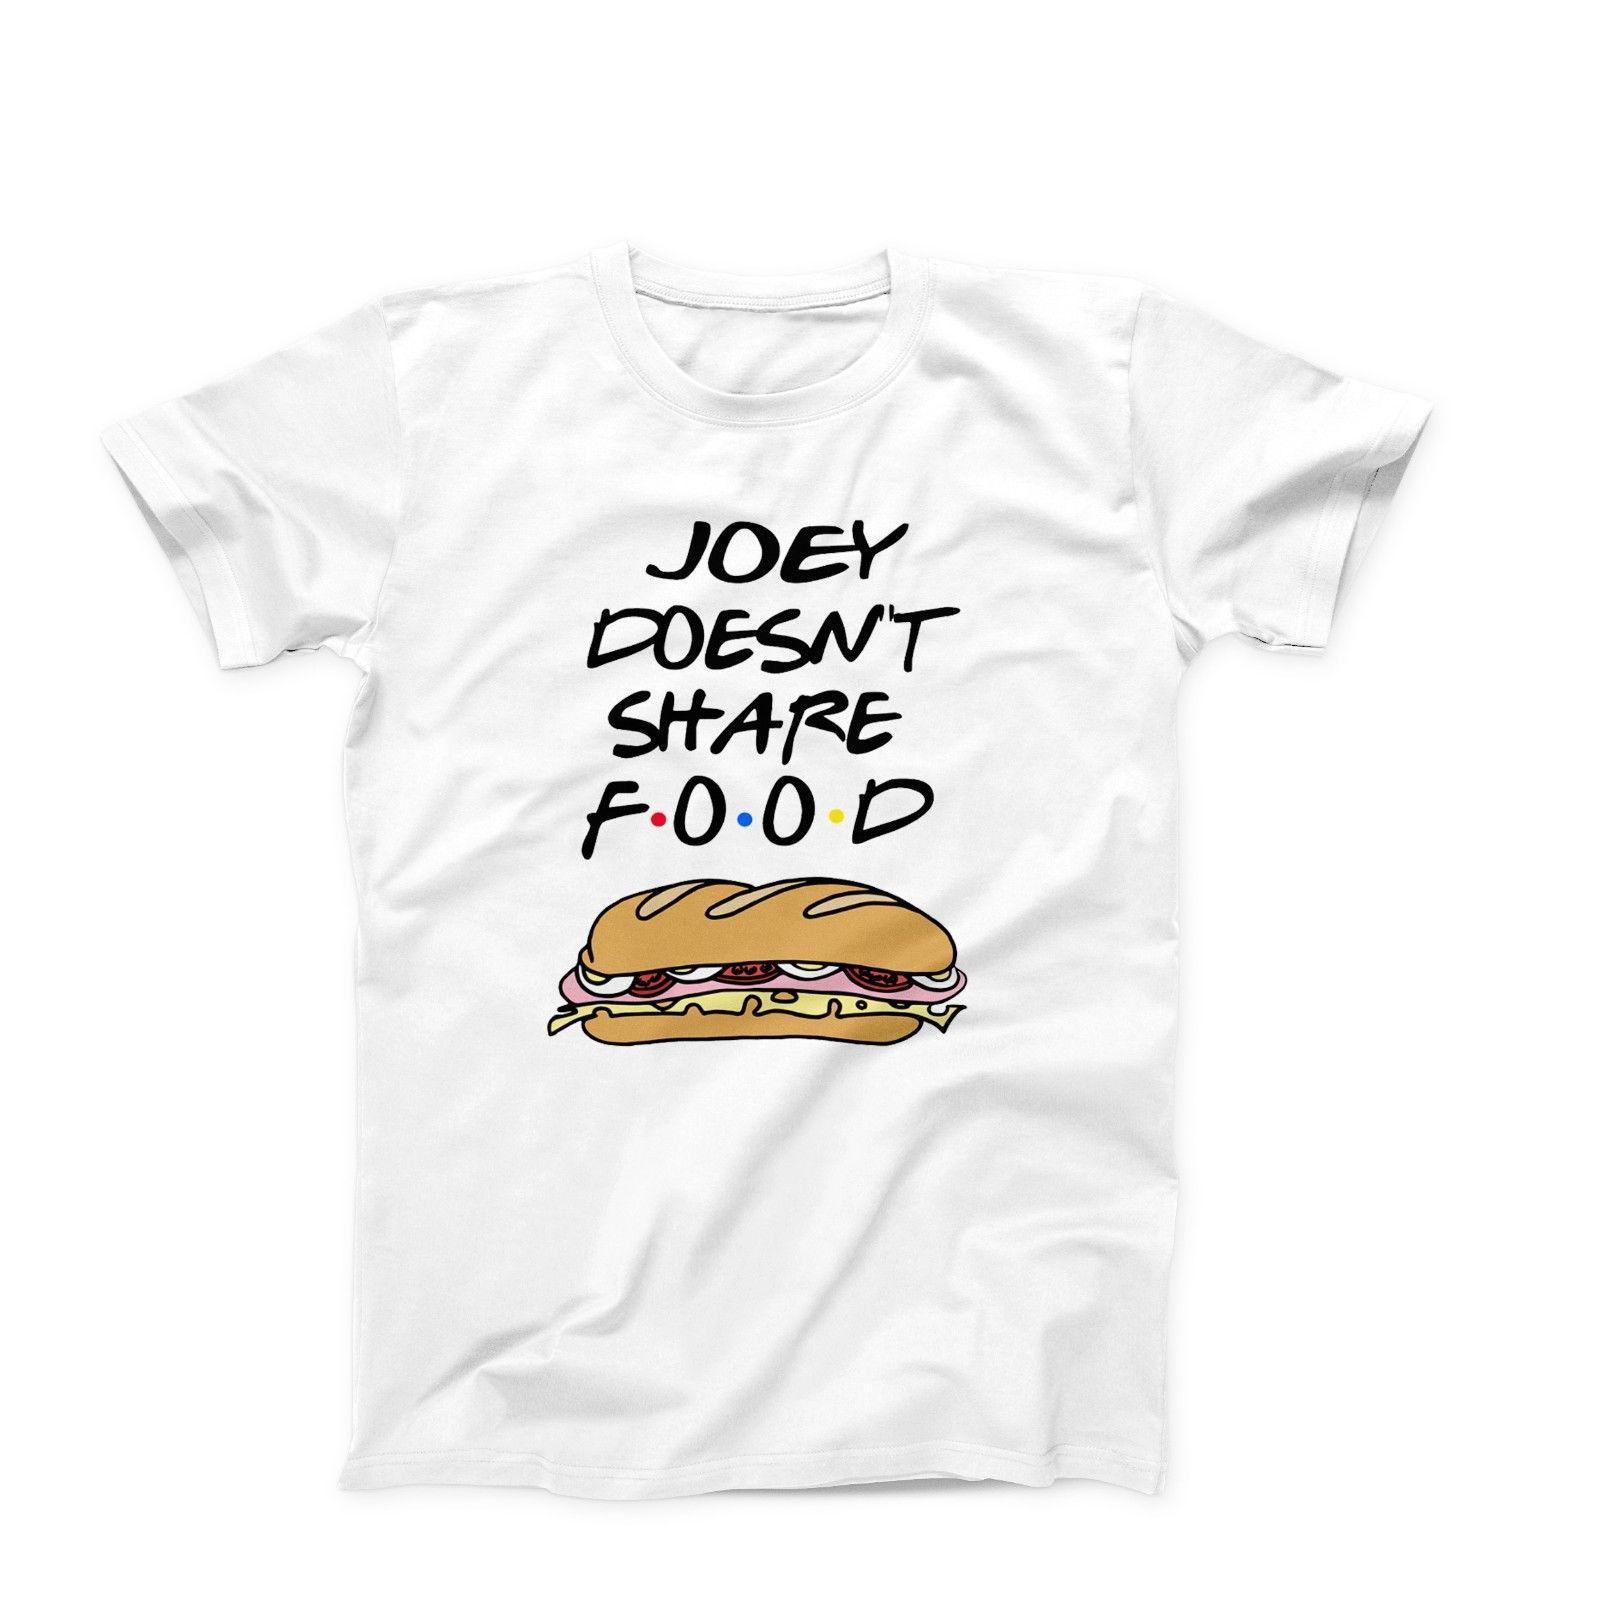 Friends Joey Tribbiani Rachel Tv Show Funny Novelty T Shirt Tee Birthday  Gift Free Shipping Short Sleeves Cotton Fashion